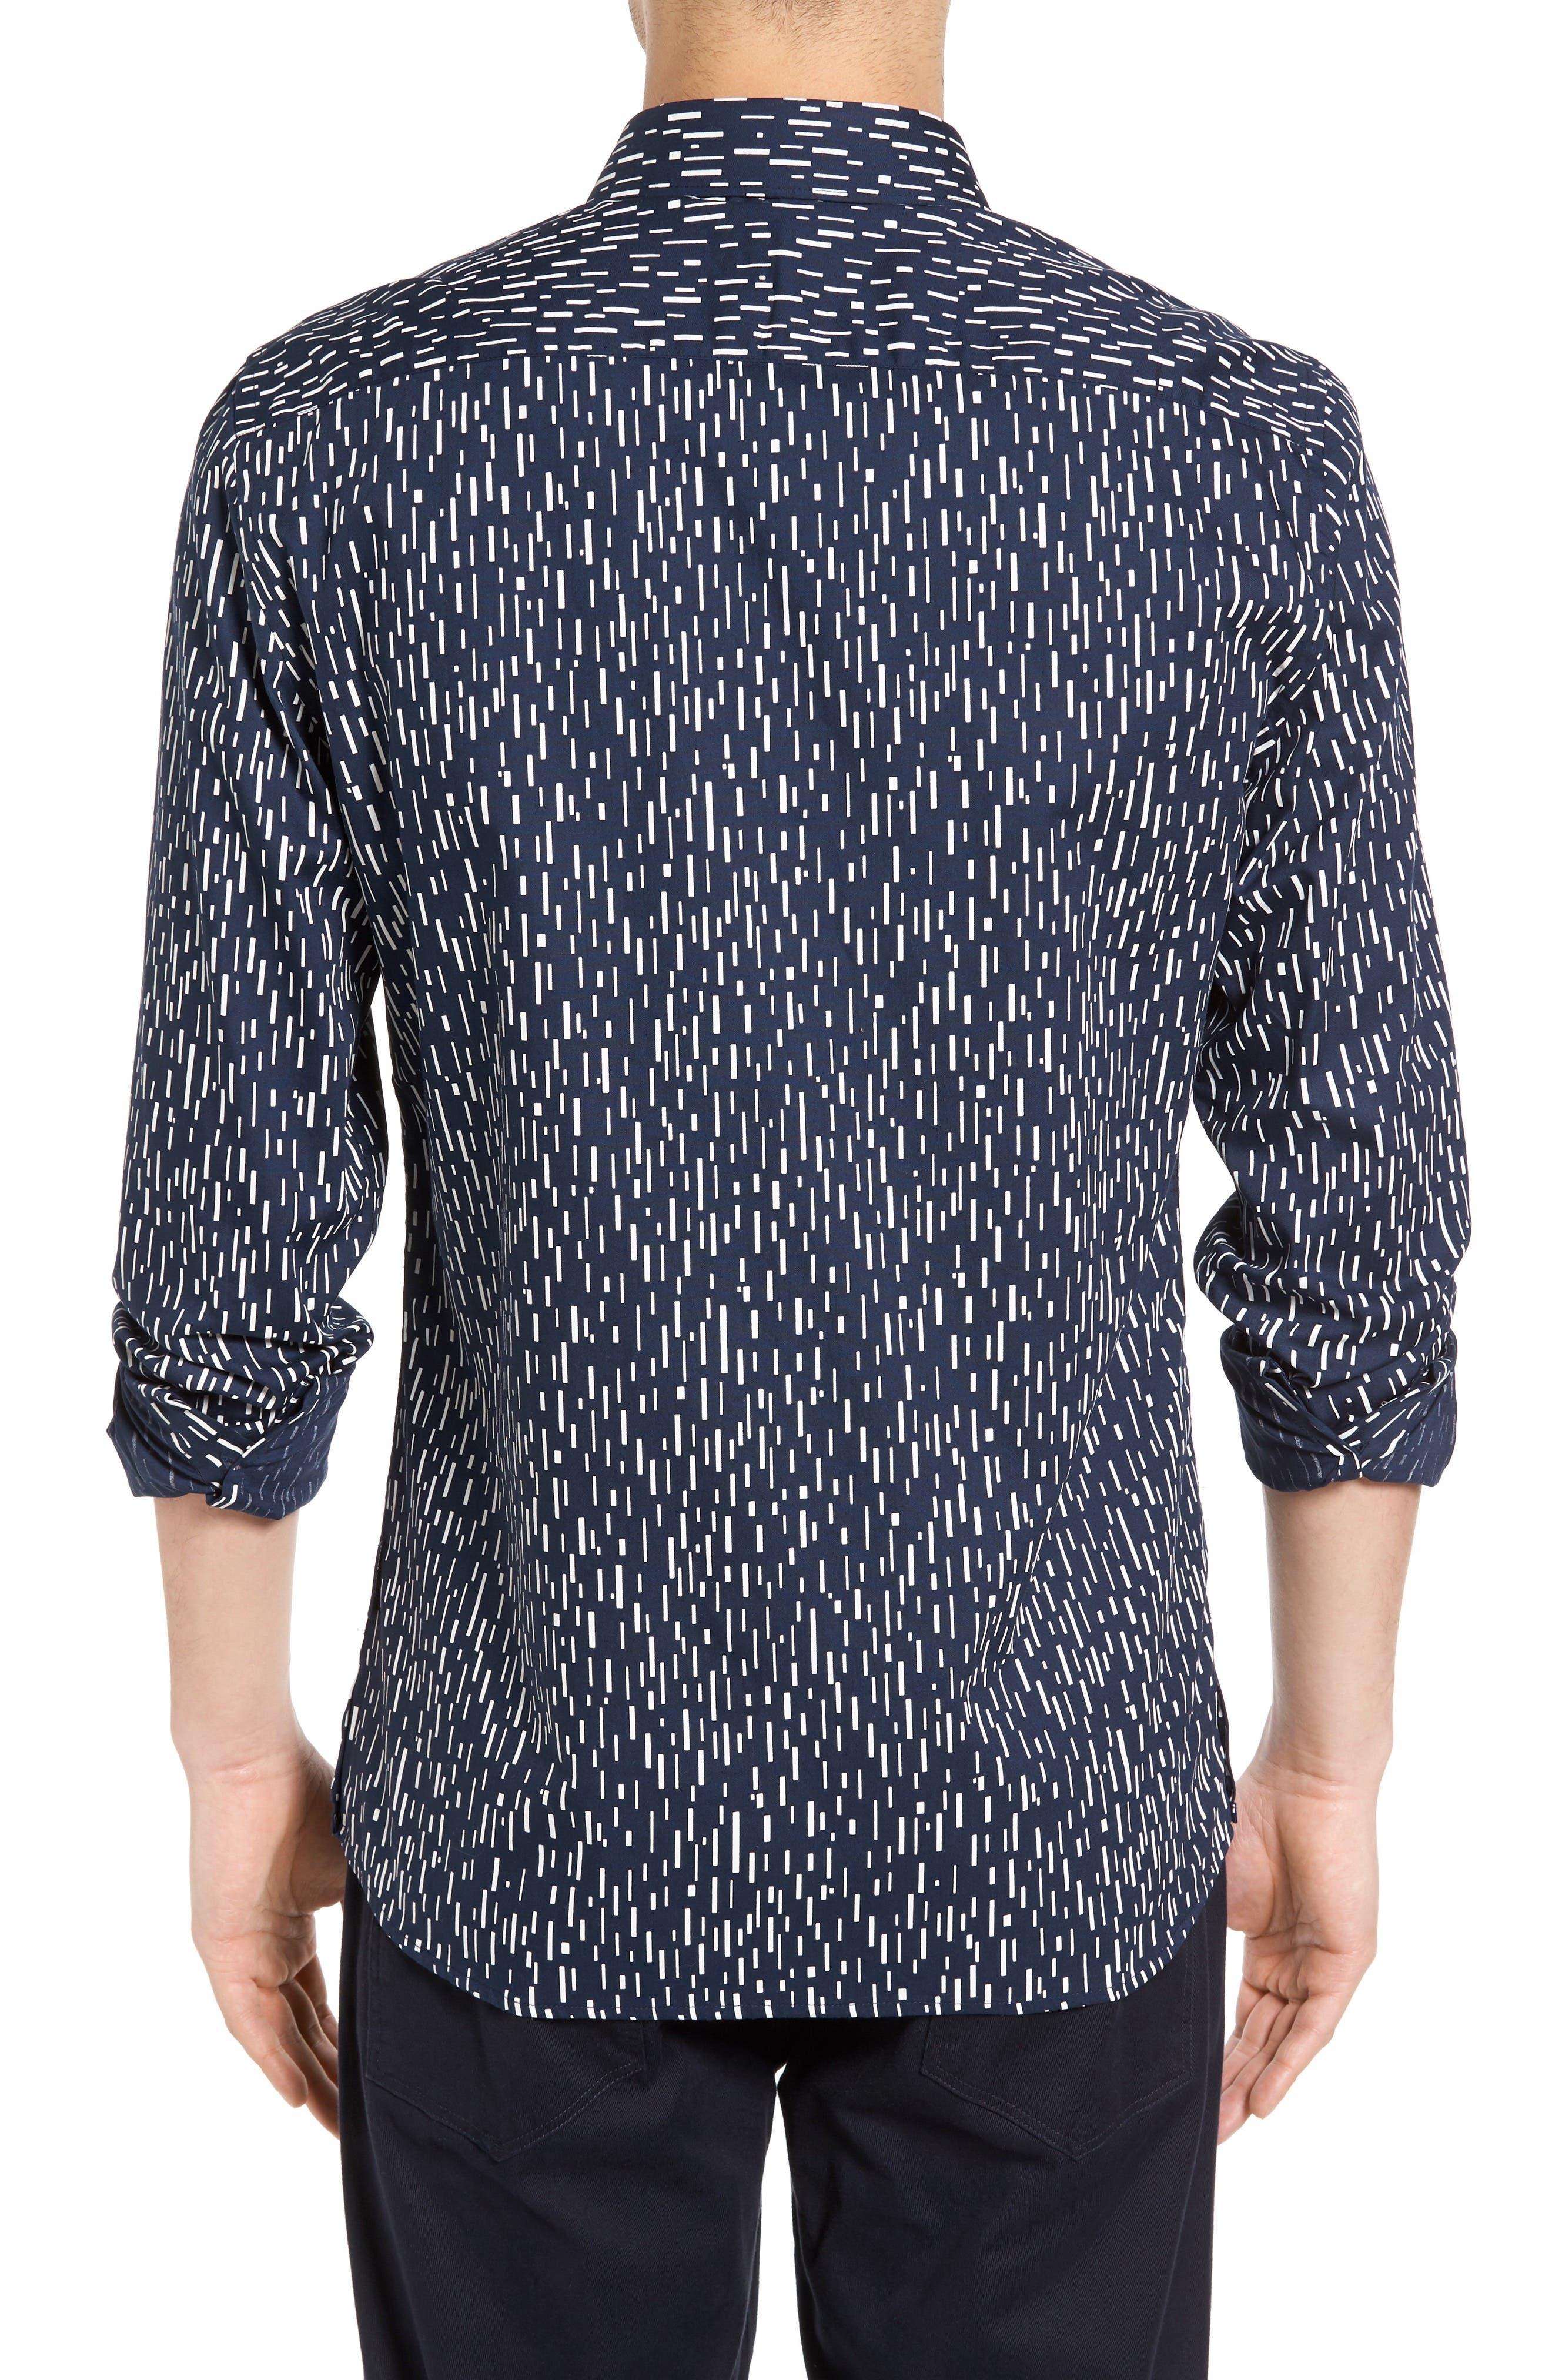 Rain Dash Slim Fit Oxford Shirt,                             Alternate thumbnail 2, color,                             407